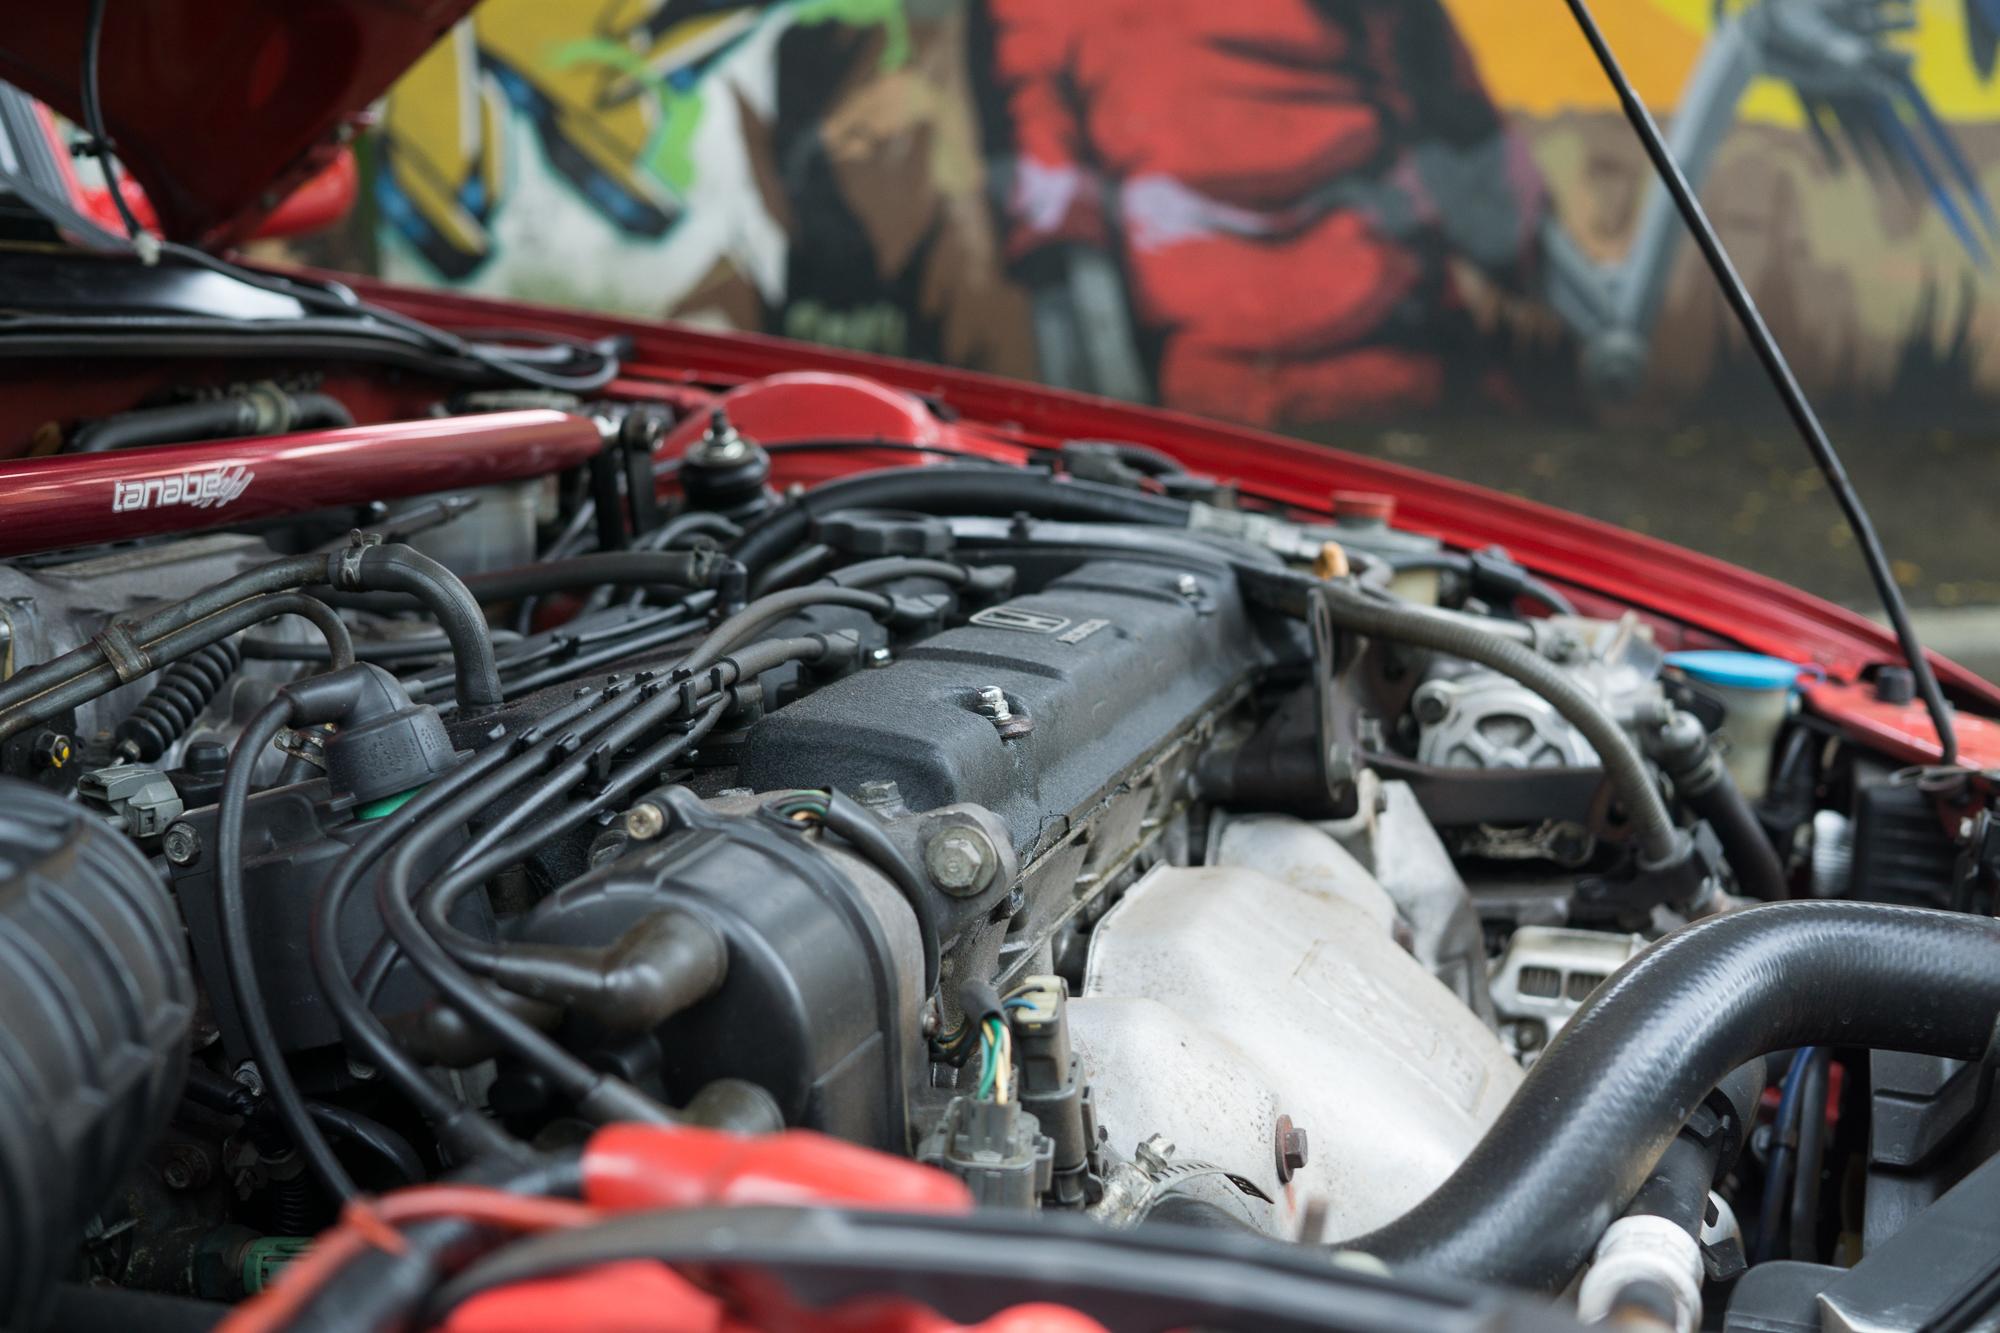 Engine of a Honda Prelude